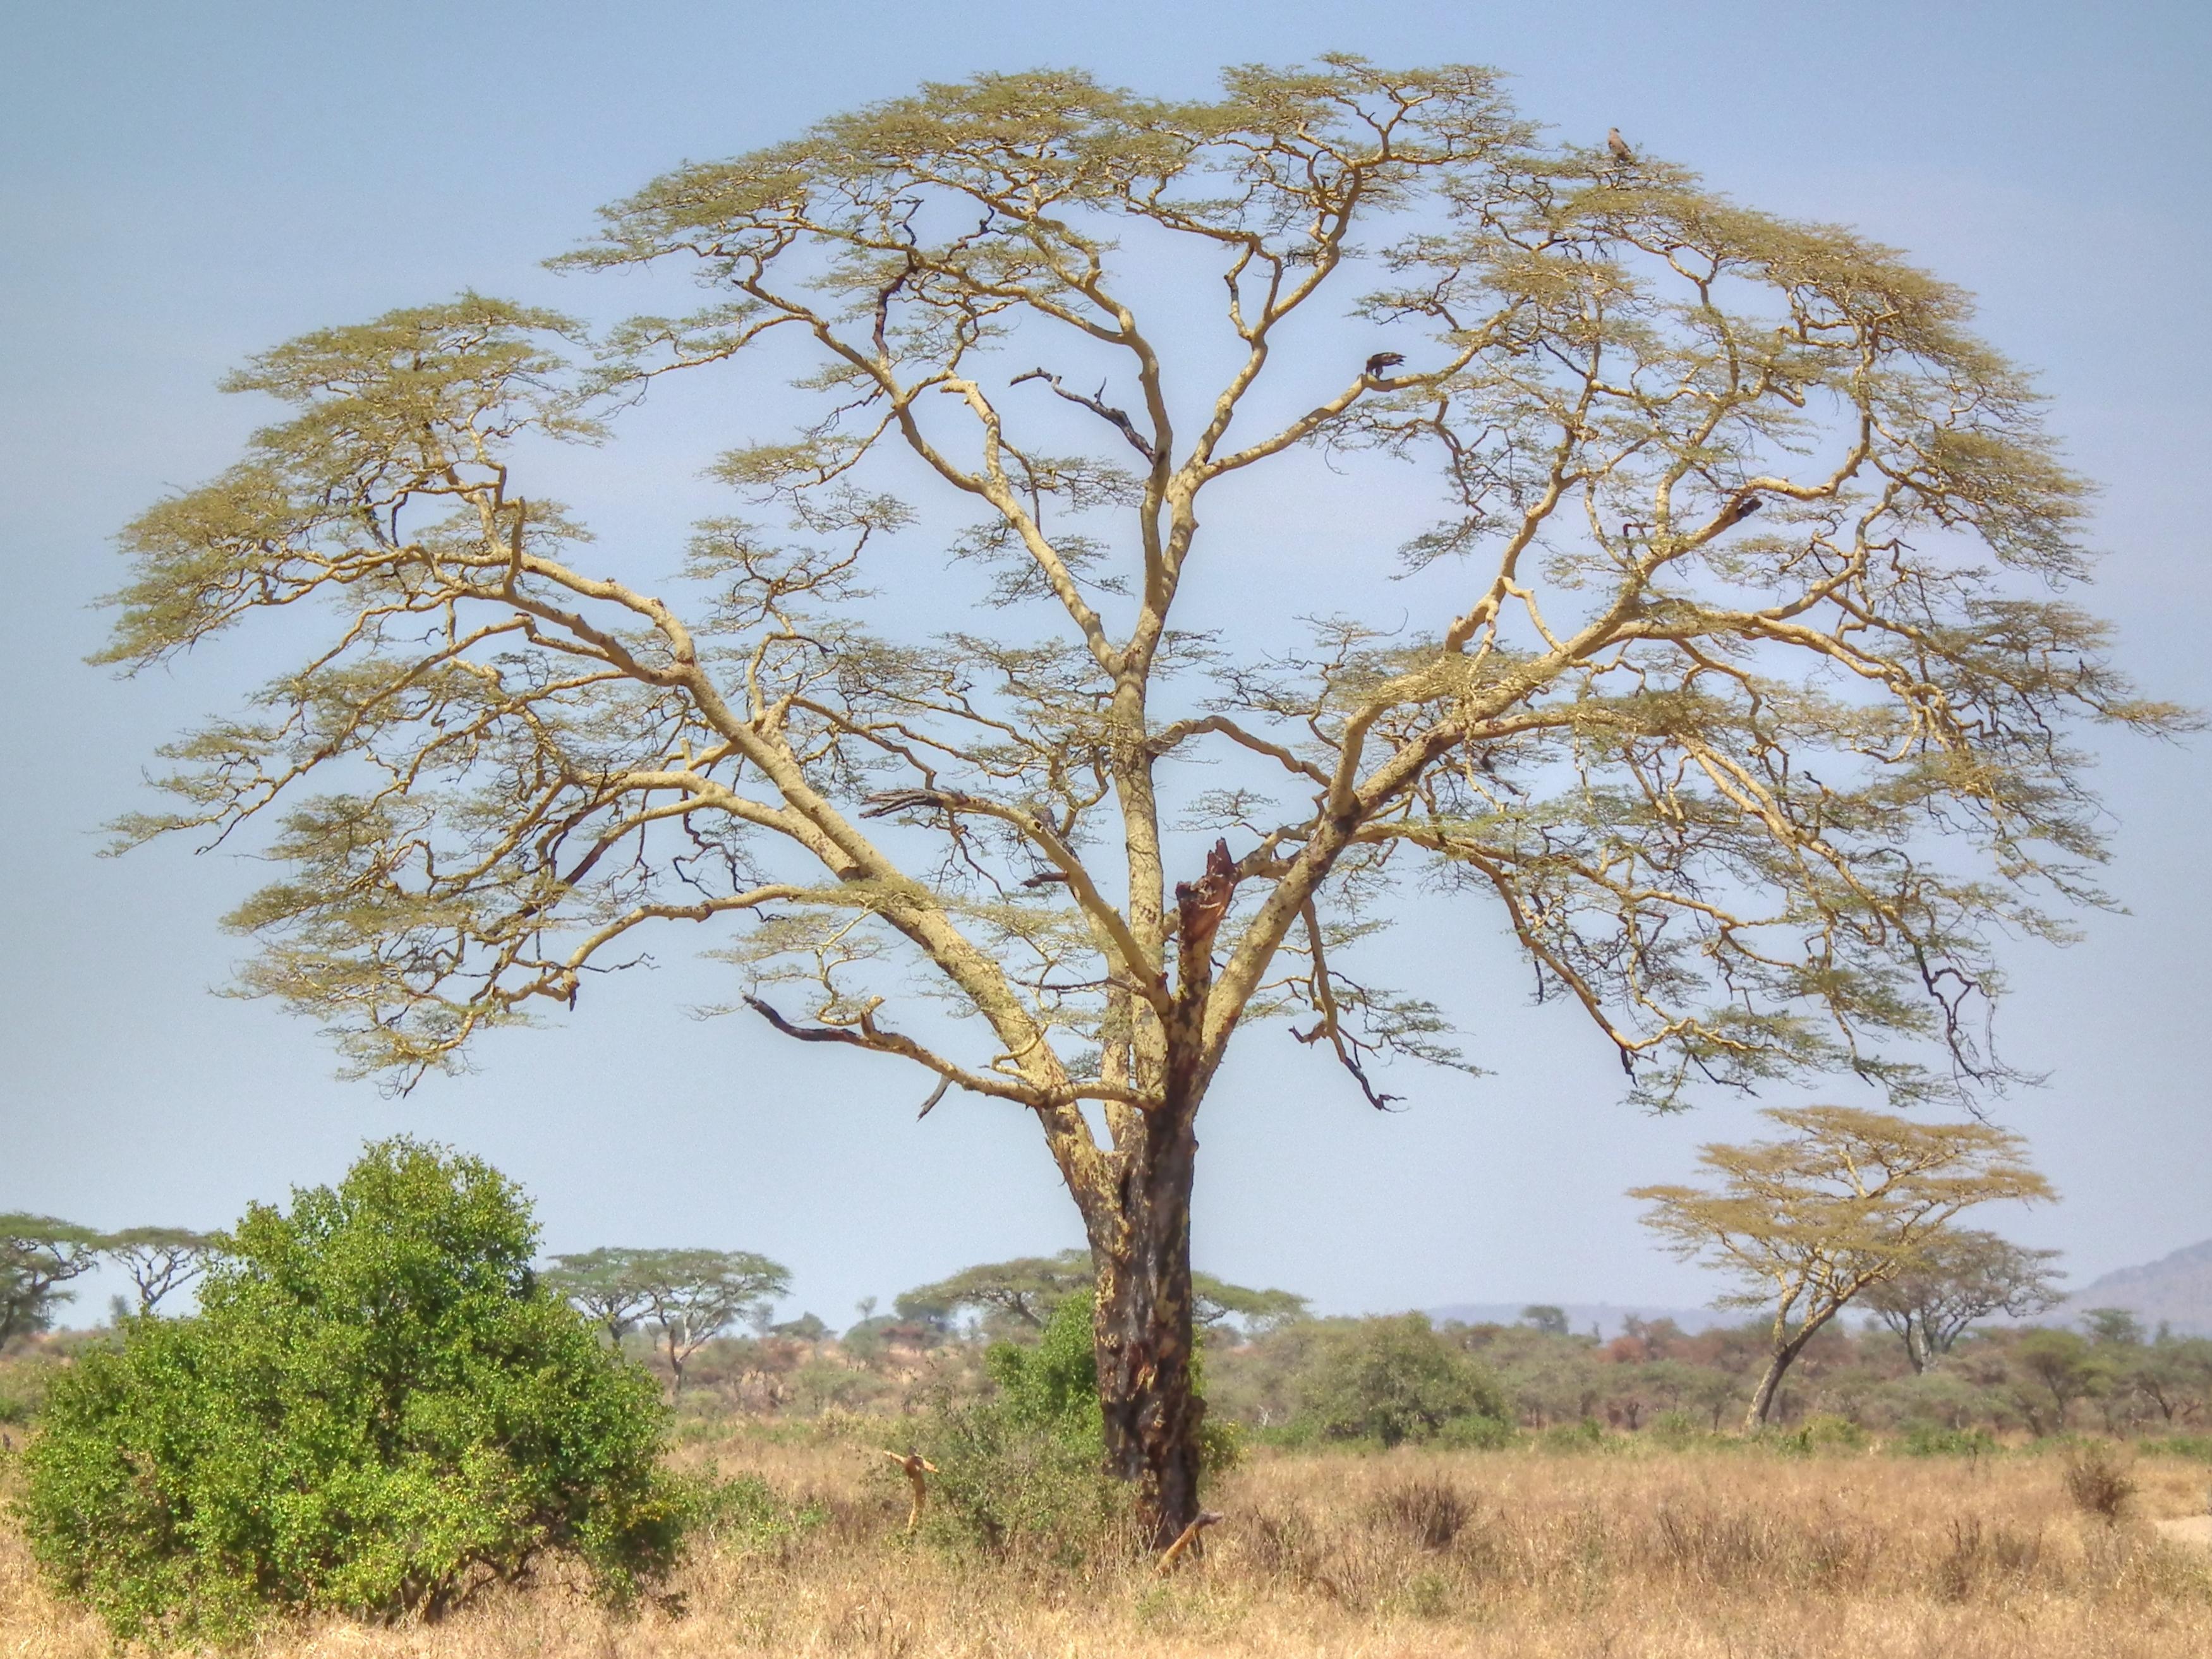 дерево ситтим фото каркас имеет